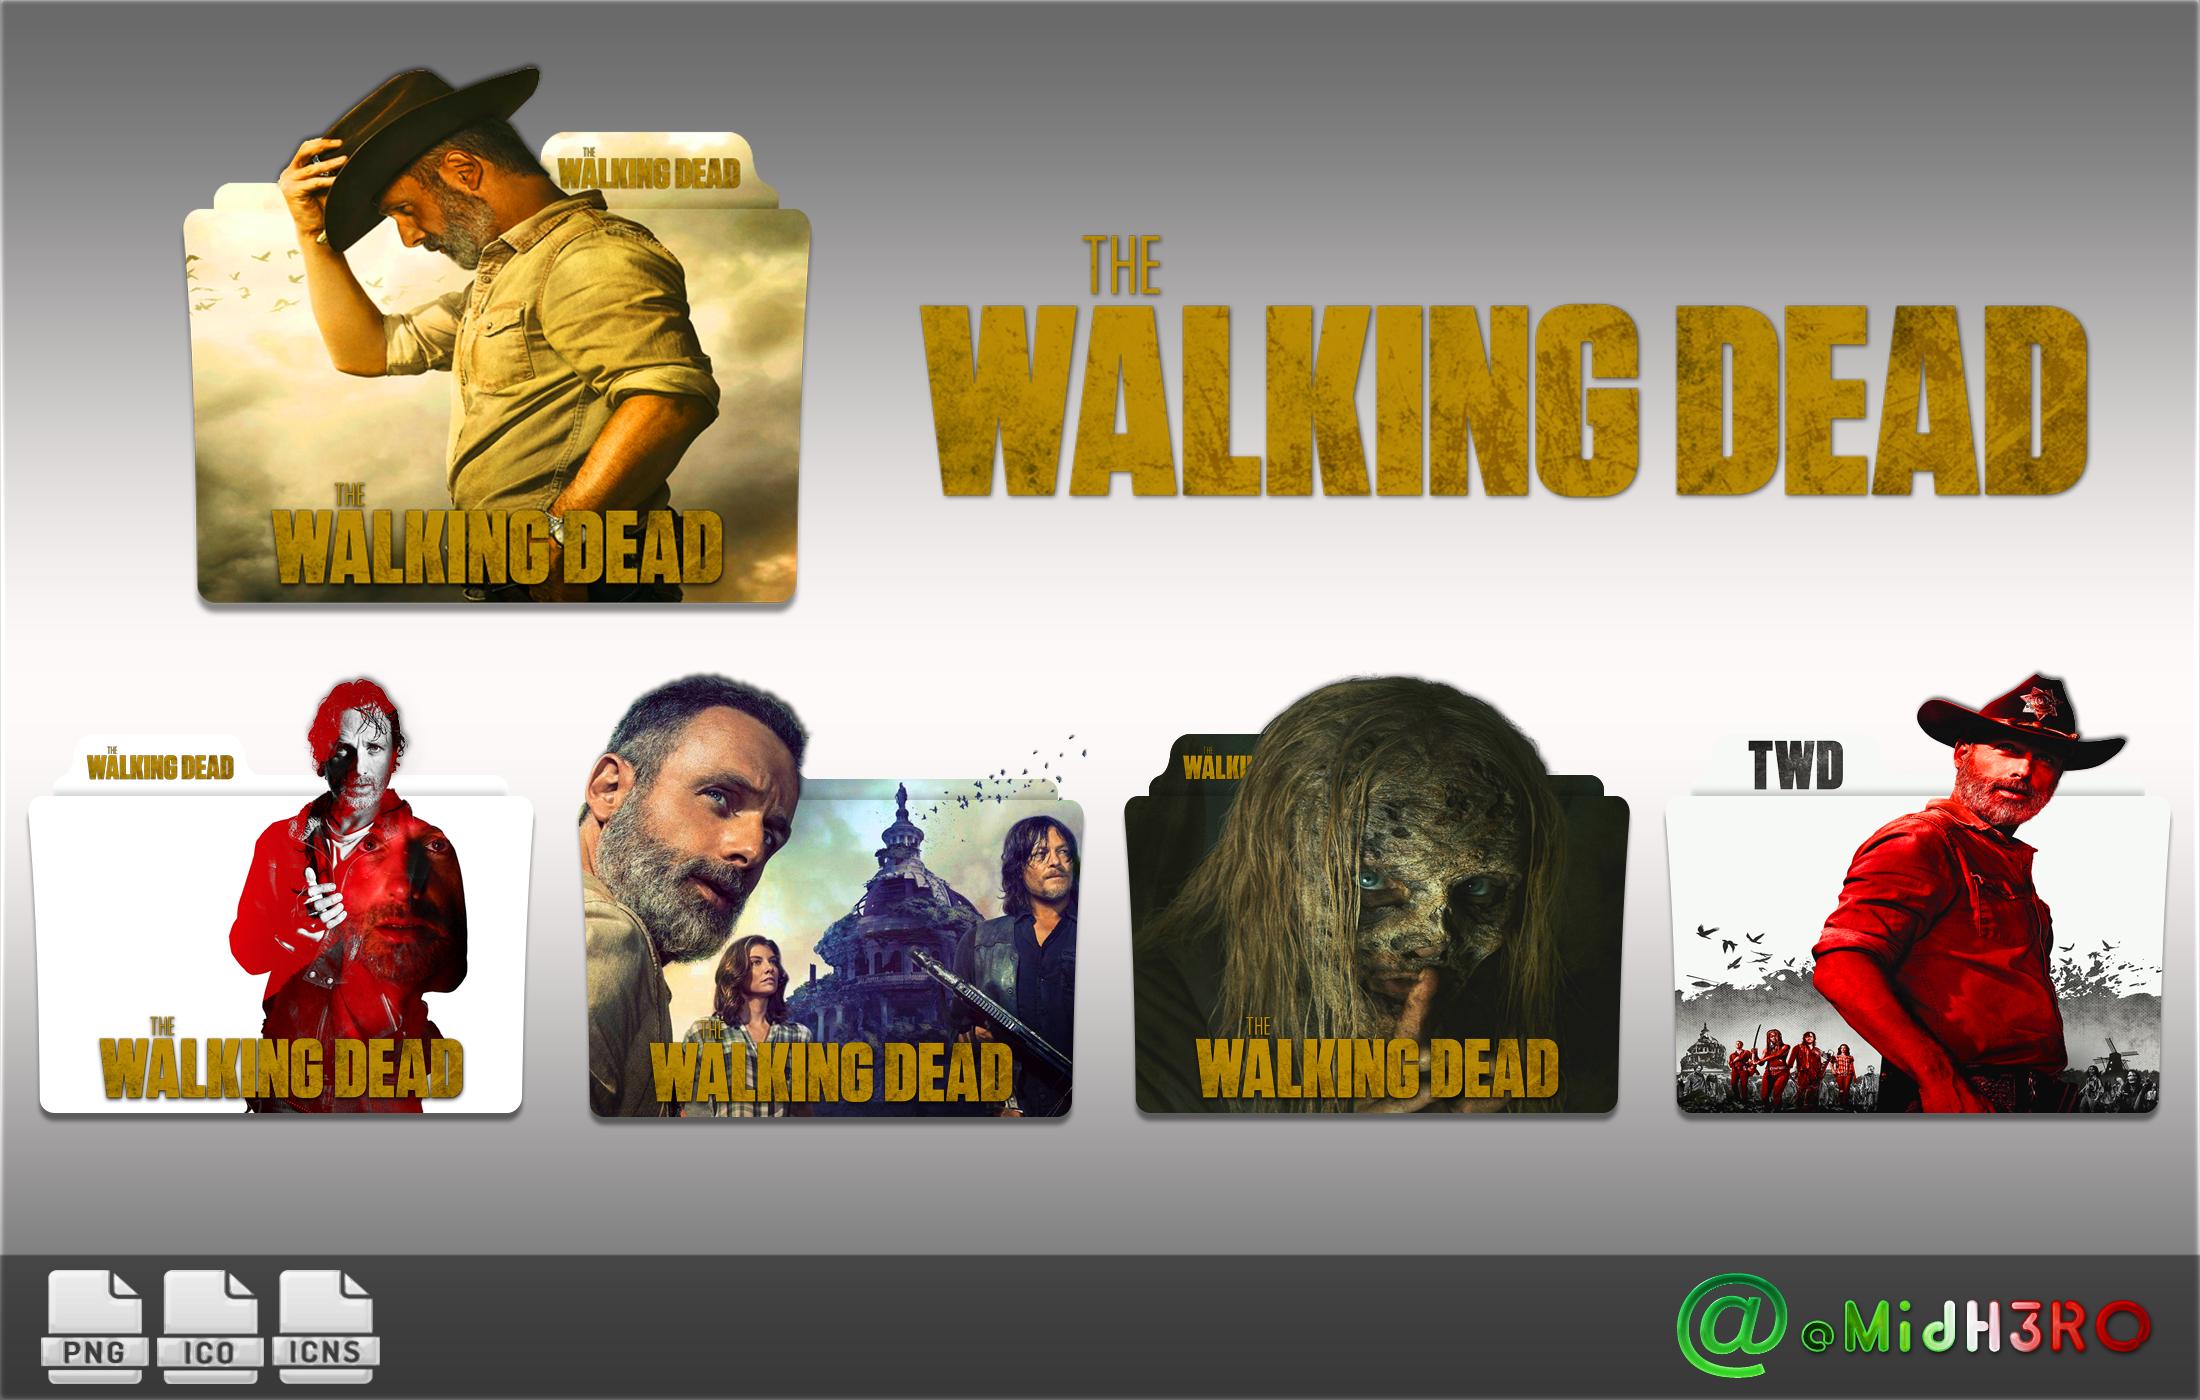 The Walking Dead Season 9 Folder Icon By Omidh3ro On Deviantart